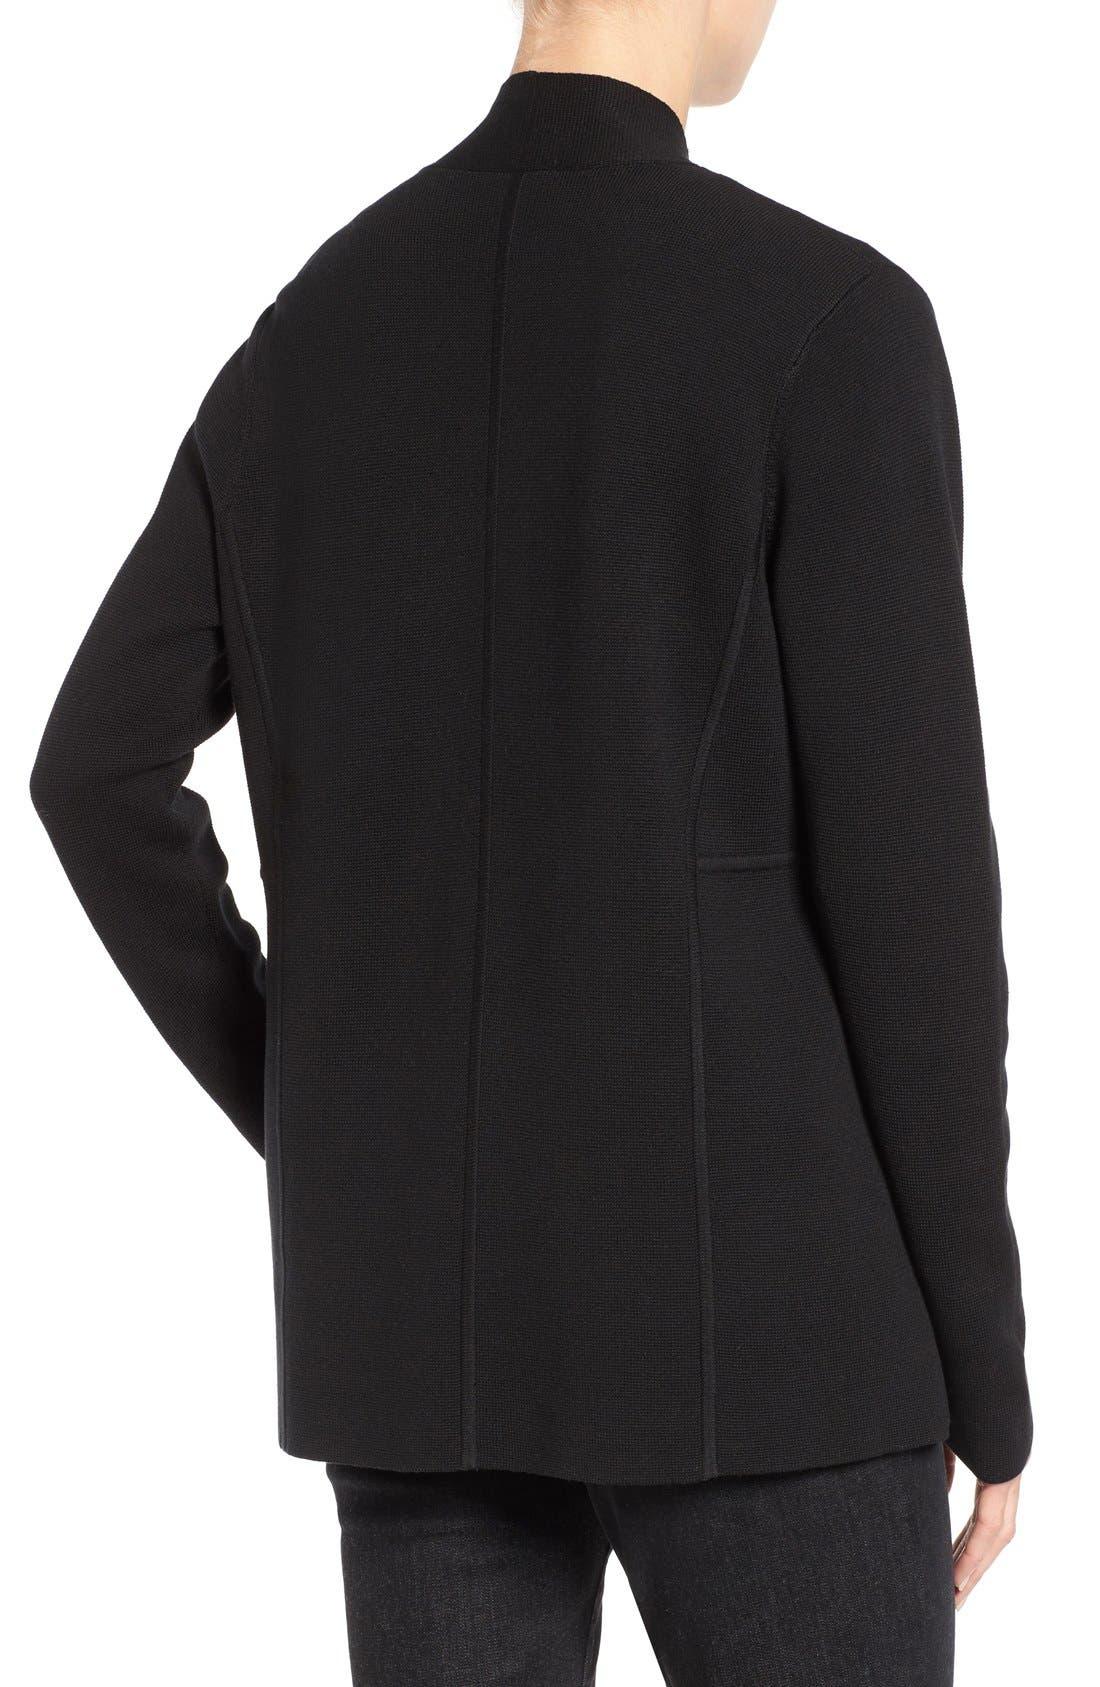 Alternate Image 2  - Eileen Fisher Silk & Organic Cotton Cardigan (Nordstrom Exclusive)